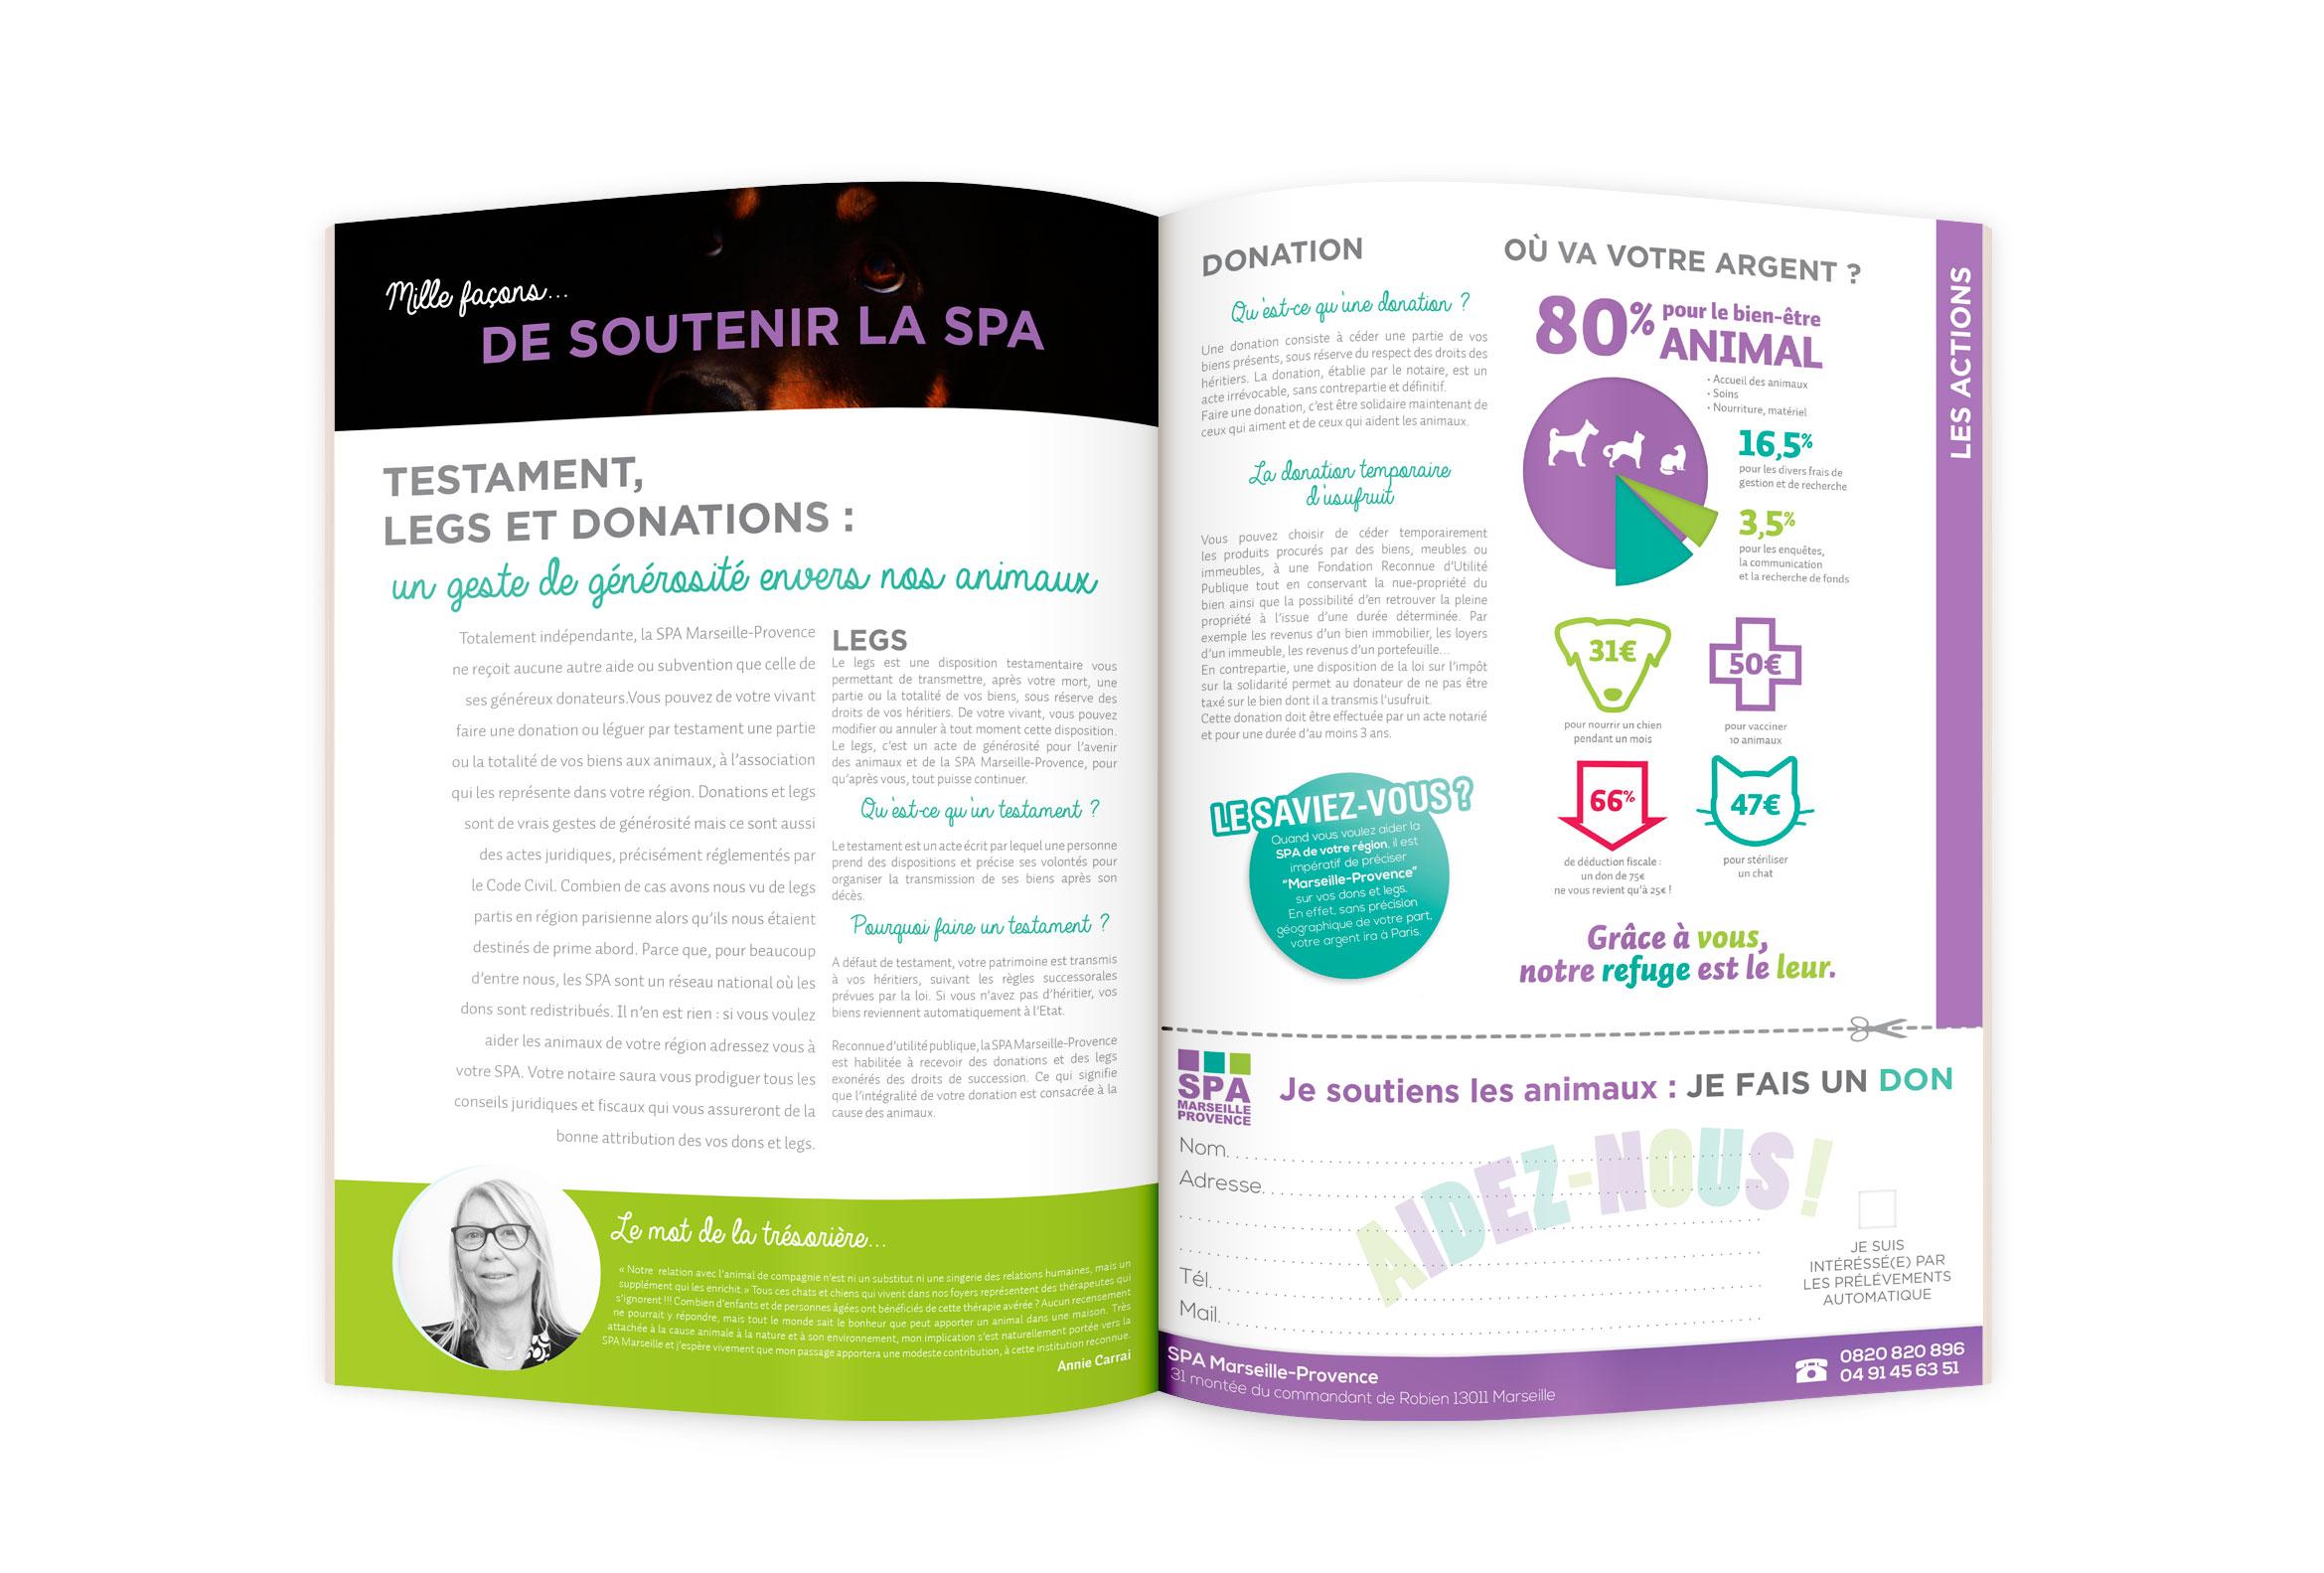 Csakébon - Magazine SPA - All rights reserved